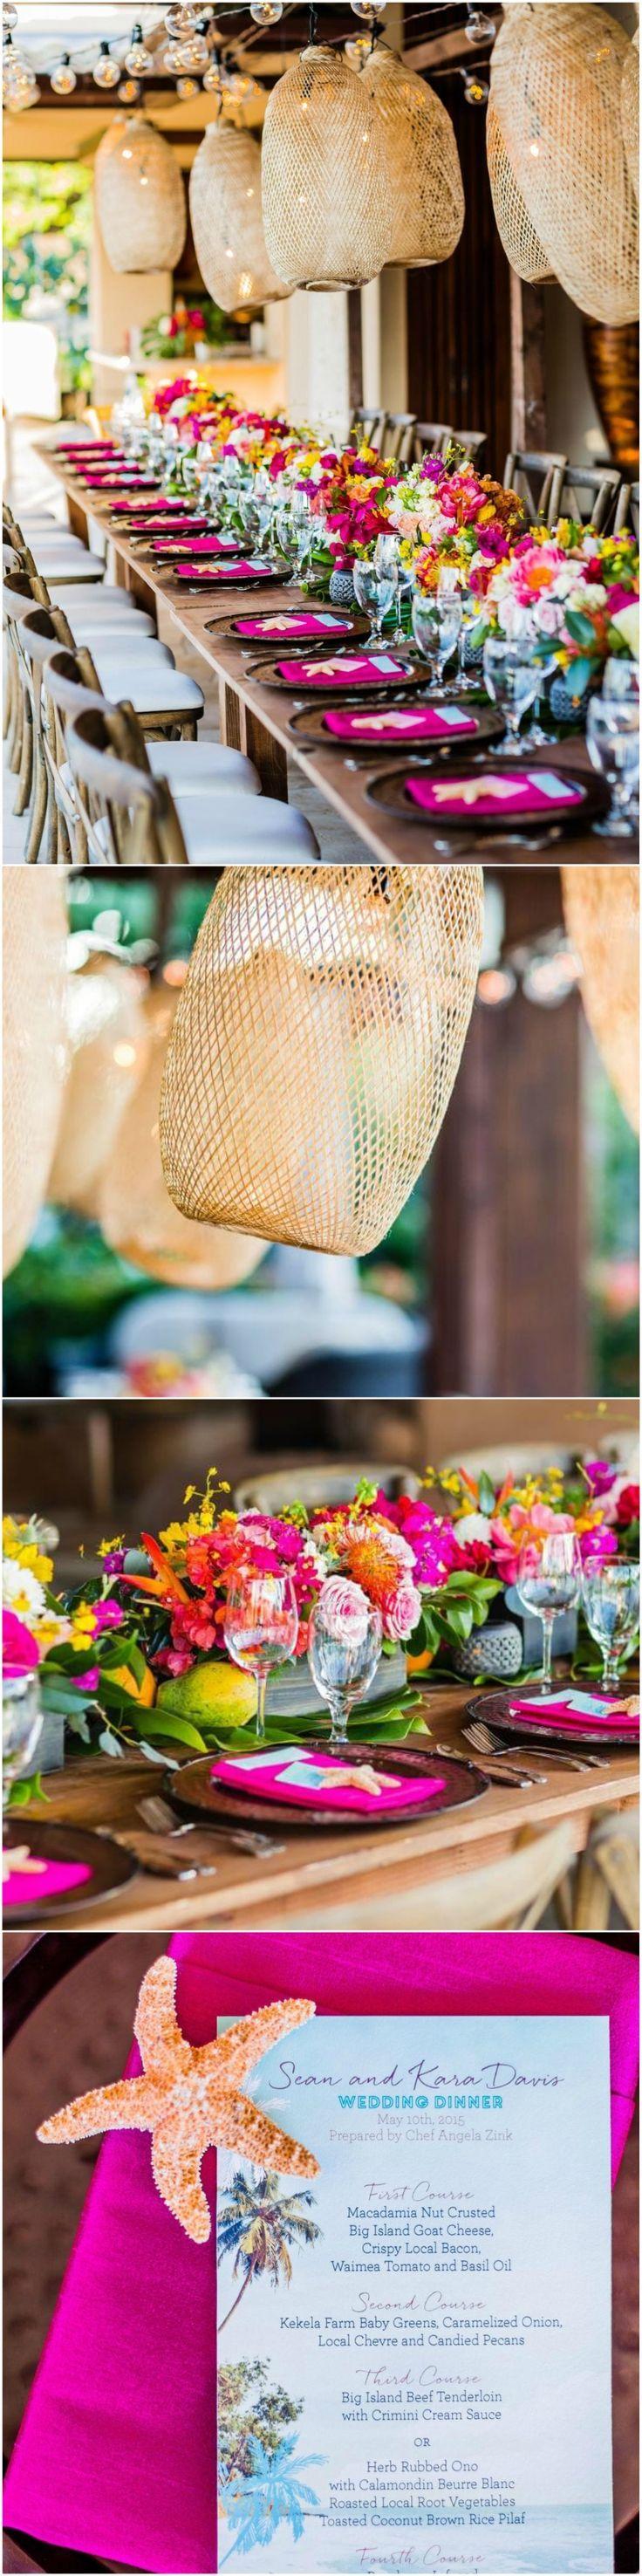 Hot pink linens, wedding reception, starfish, hanging lanterns, Hawaiian  table décor, event design, tropical flowers